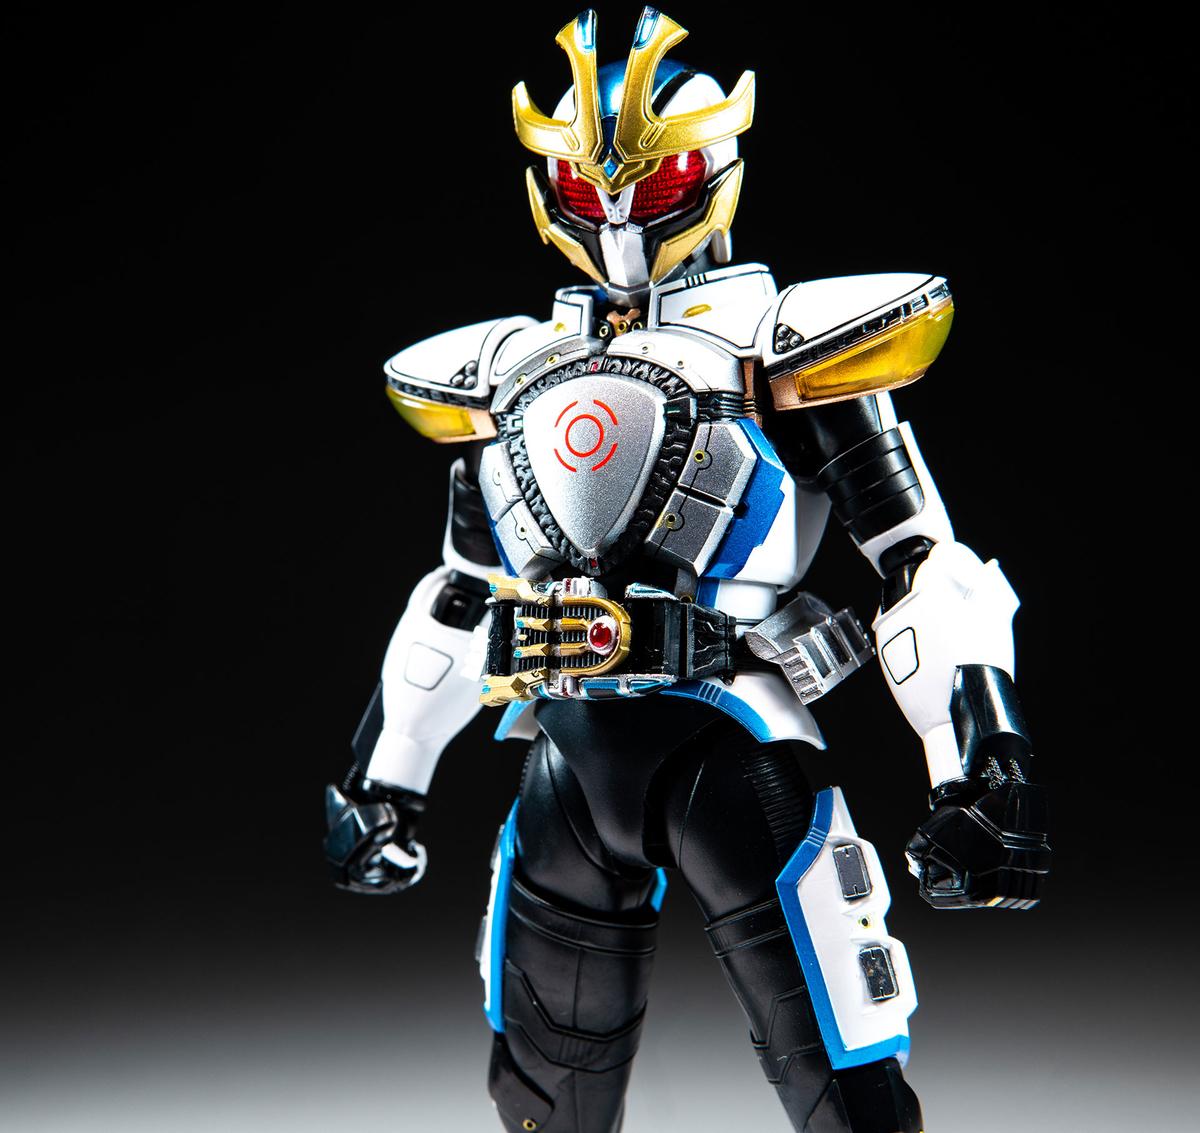 f:id:hiroban-ch:20210718014522j:plain